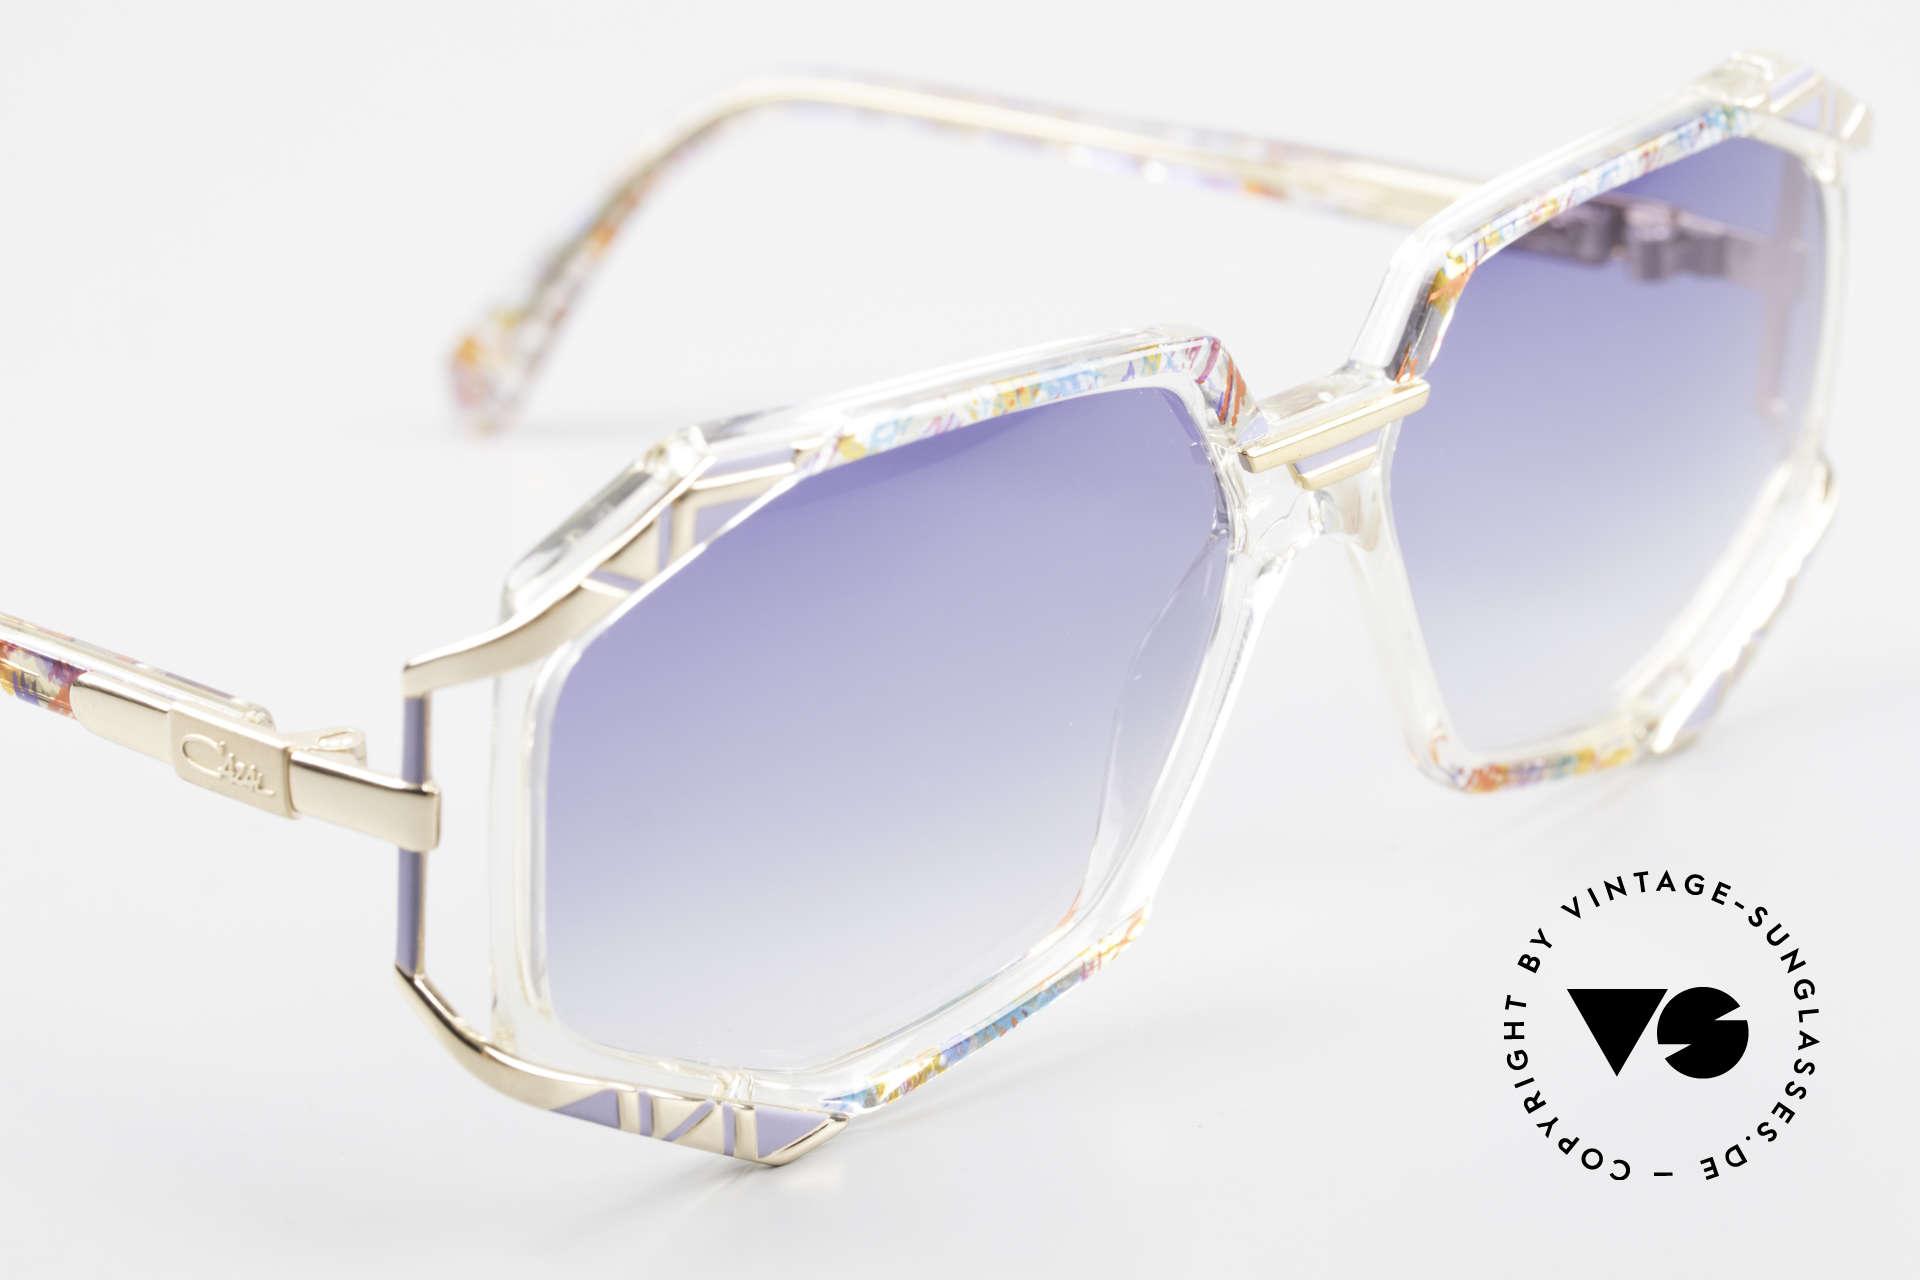 Cazal 355 Extraordinary Sunglasses 90's, unworn, NOS (like all our rare CAZAL vintage eyewear), Made for Women